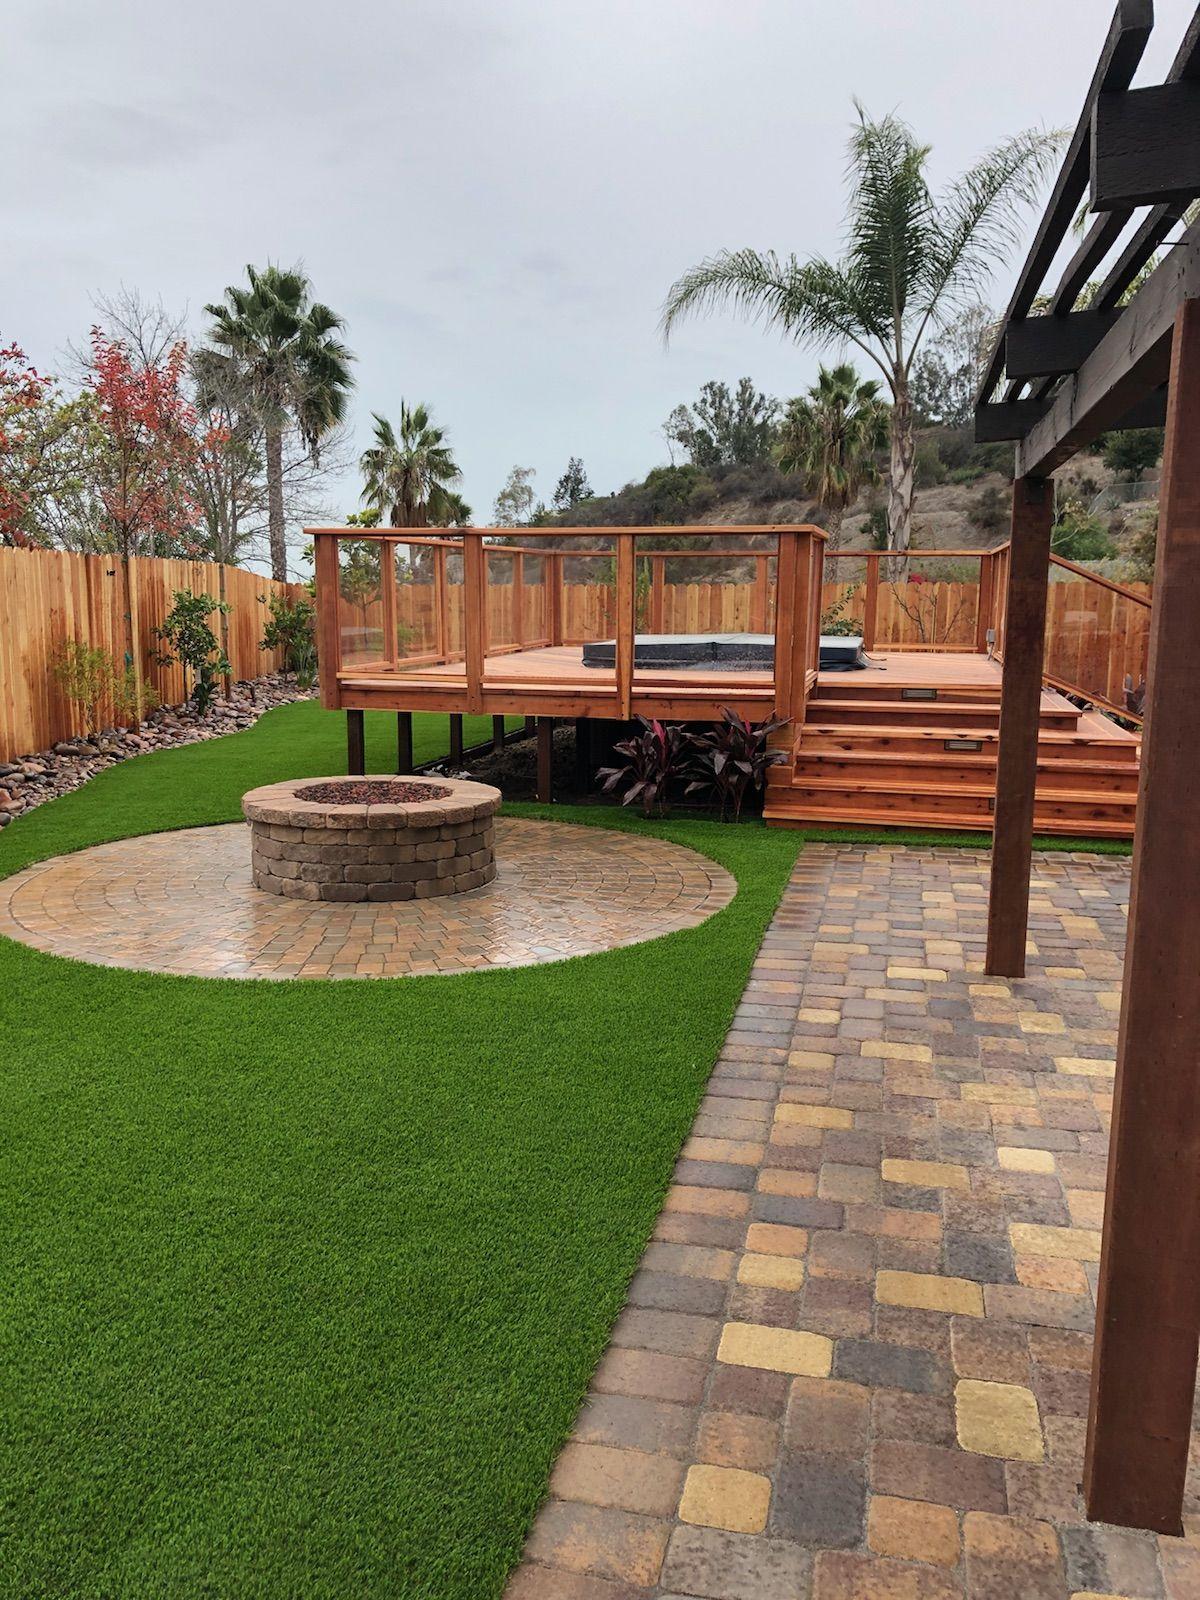 Backyard Removal Artificial Grass Backyard Artificial Grass Artificial Grass Garden